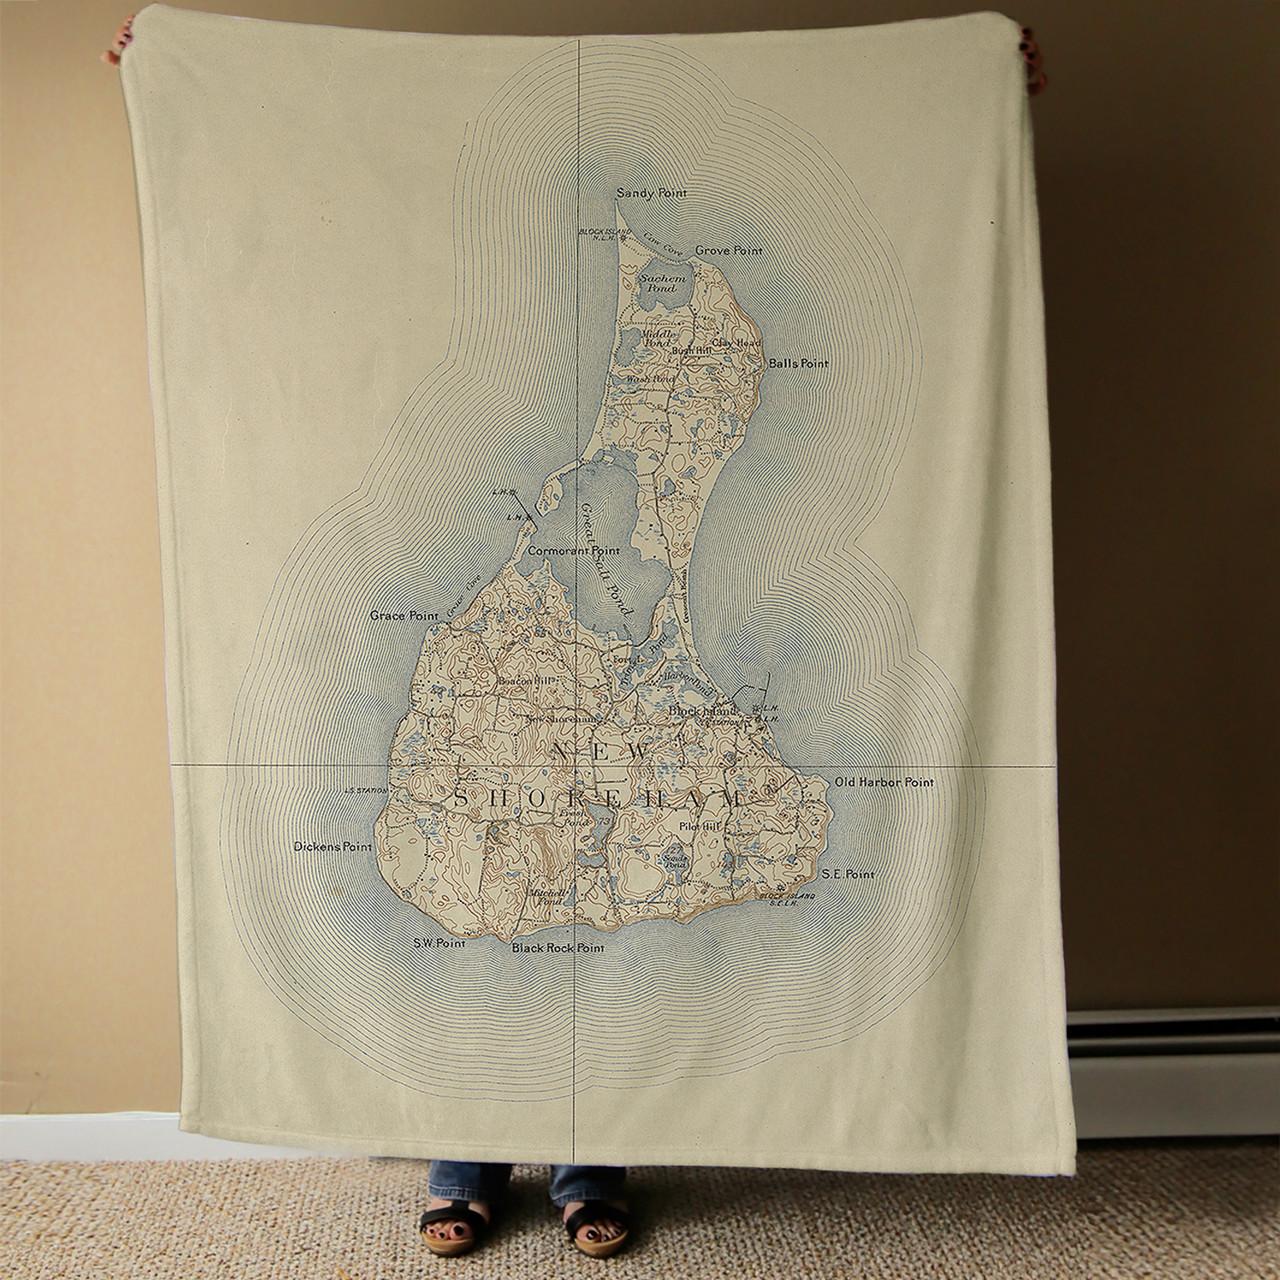 Block Island, RI #2 (MSF-B-006)